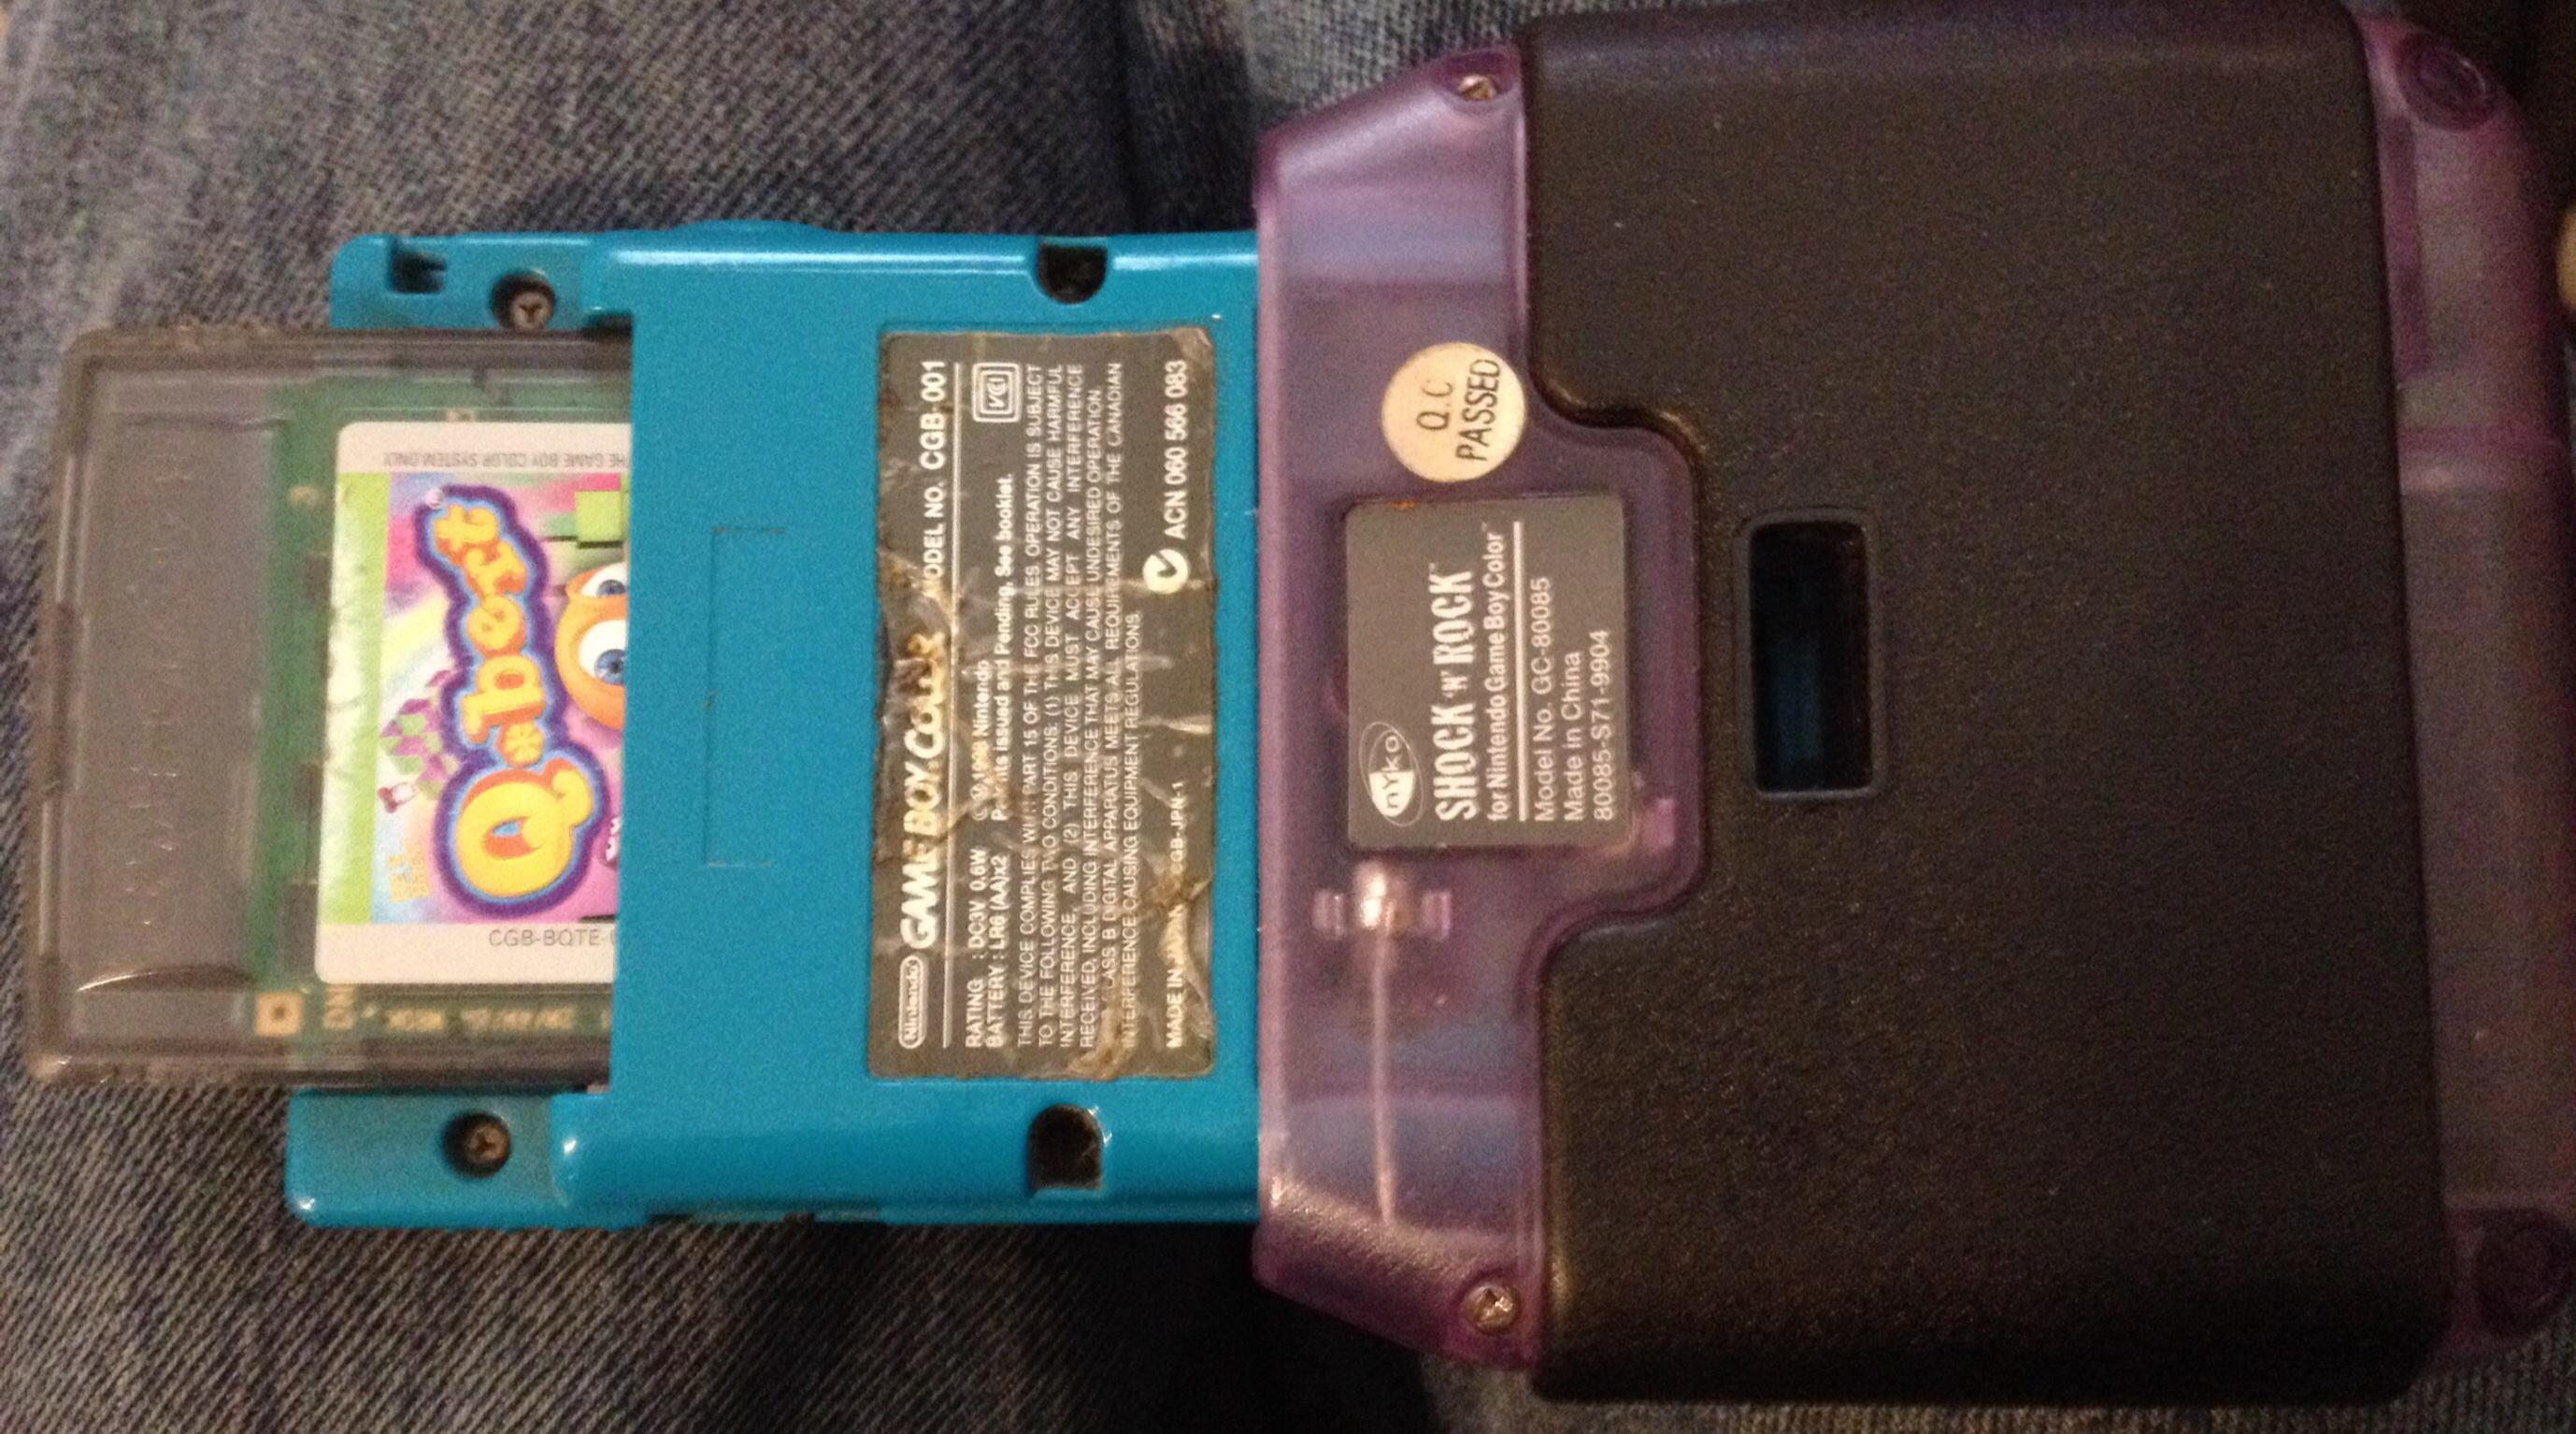 zerooskul: Q*bert (Game Boy Color) 23,100 points on 2019-10-15 13:37:56